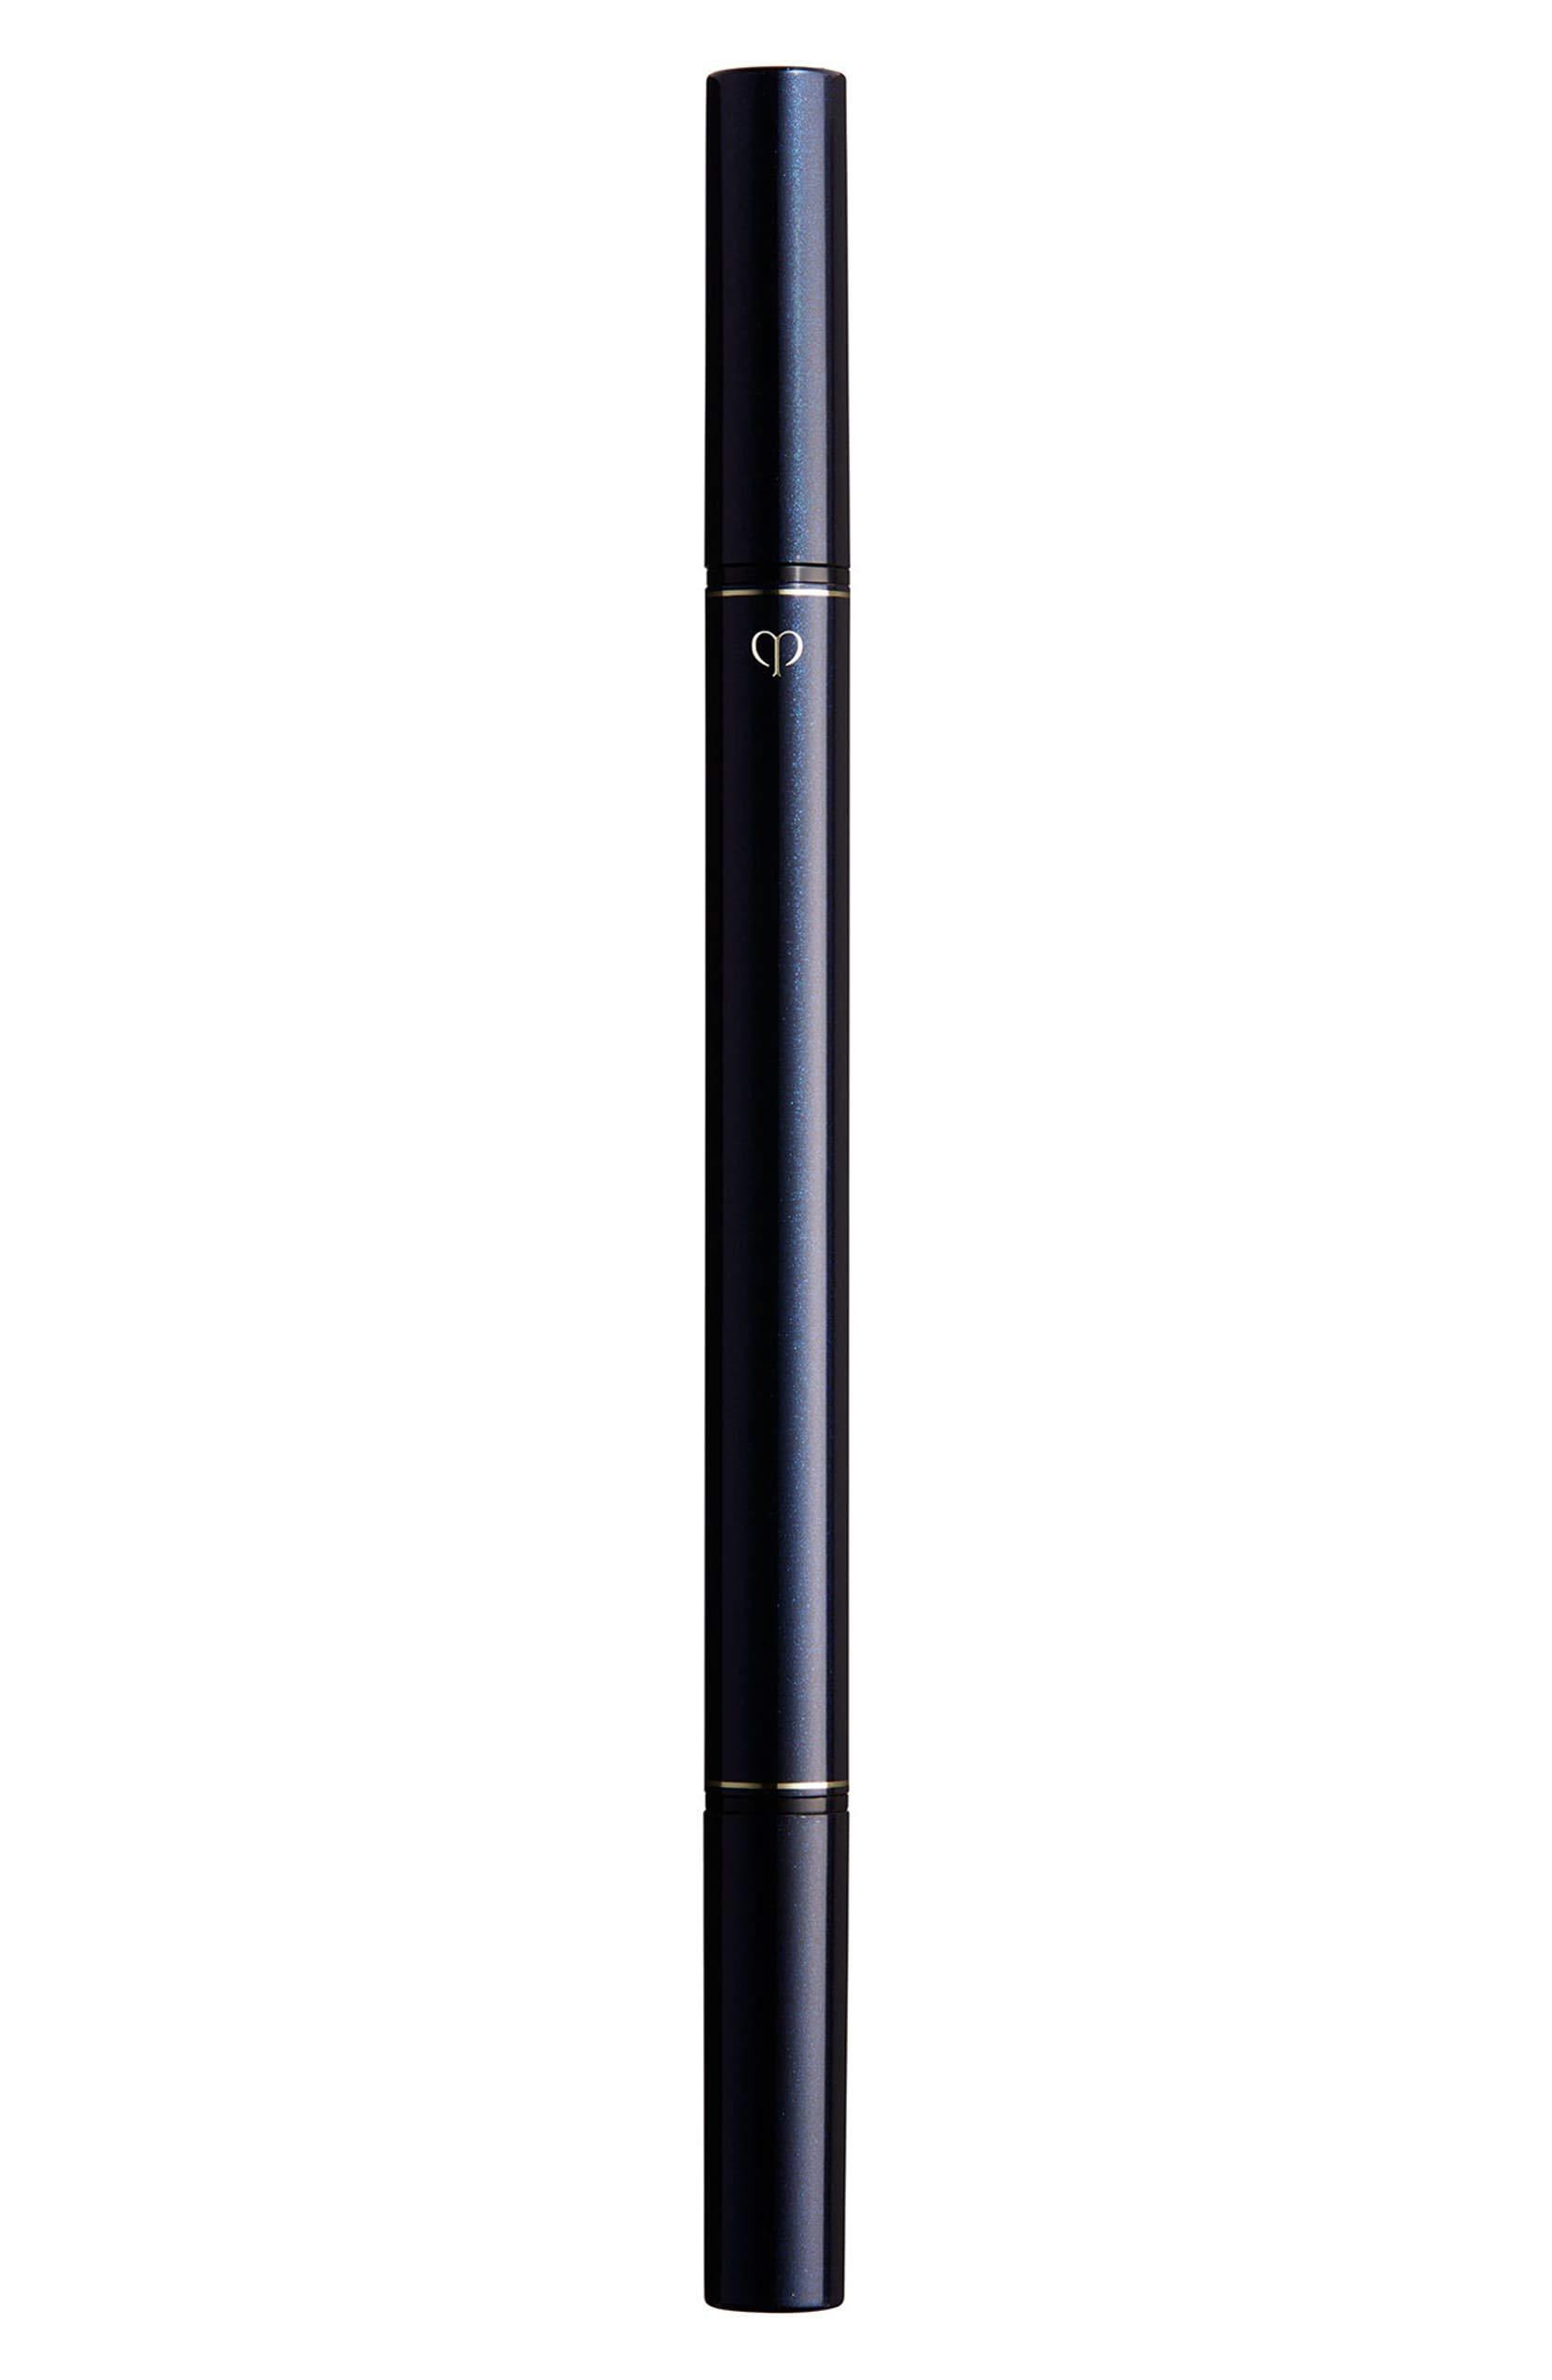 Cle De Peau Beaute Intensifying Liquid Eyeliner 1 Black Full Size 0.8 mL / .02 FL. OZ. In Retail Box by Cle De Peau Beaute